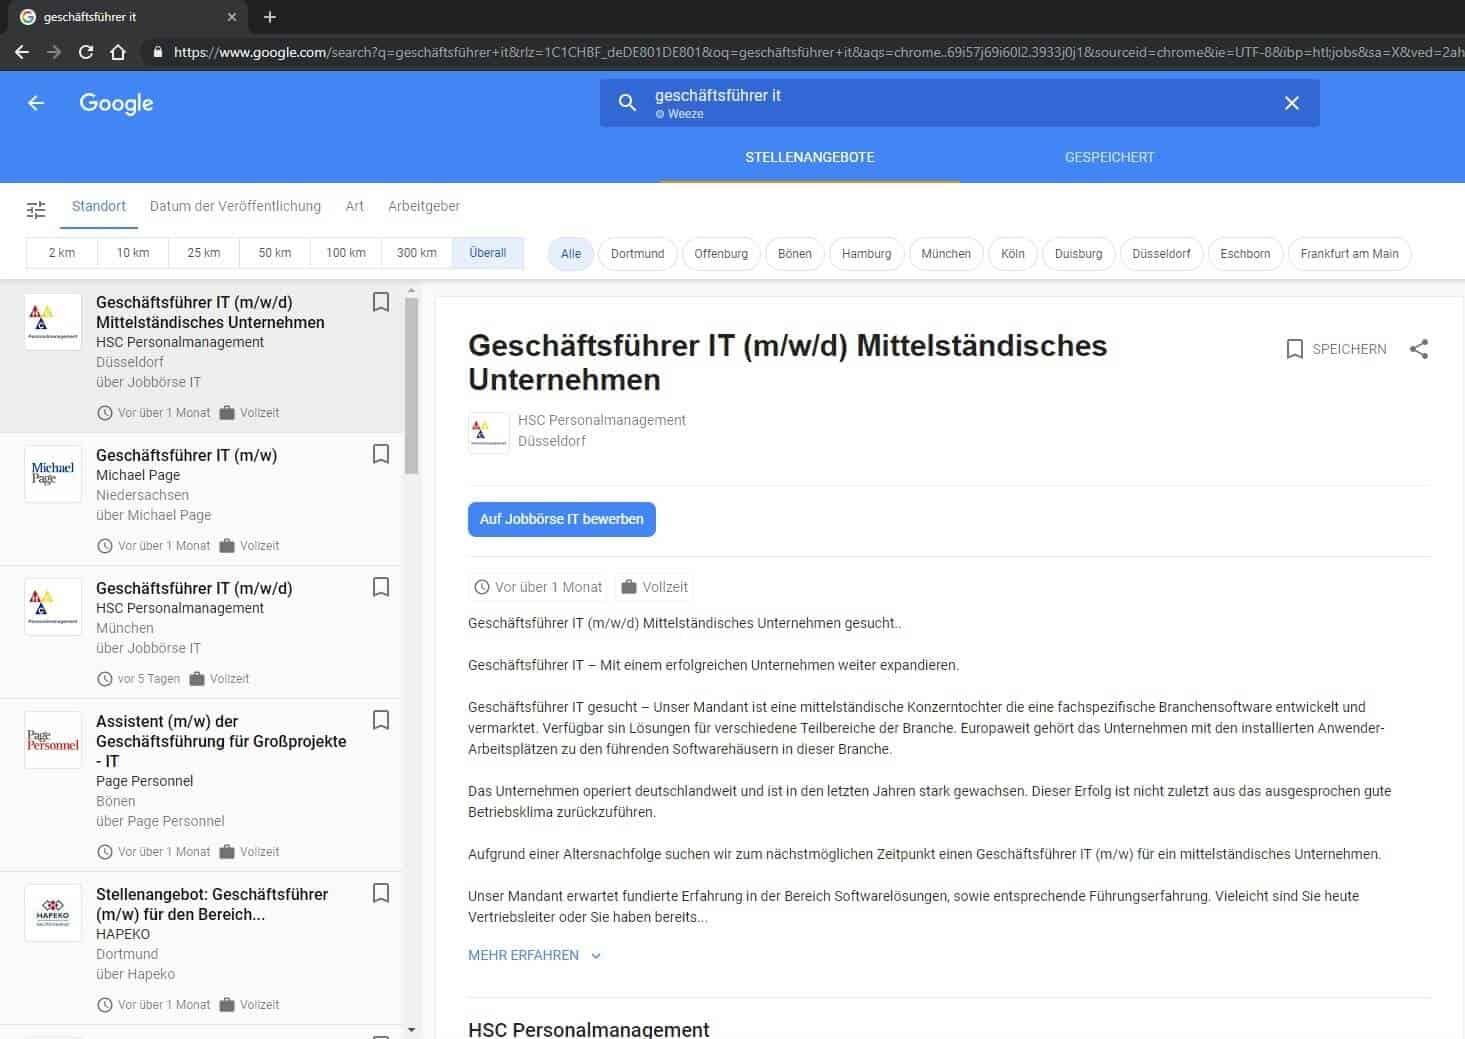 Geschäfsführer It Suche bei Google for Jobs